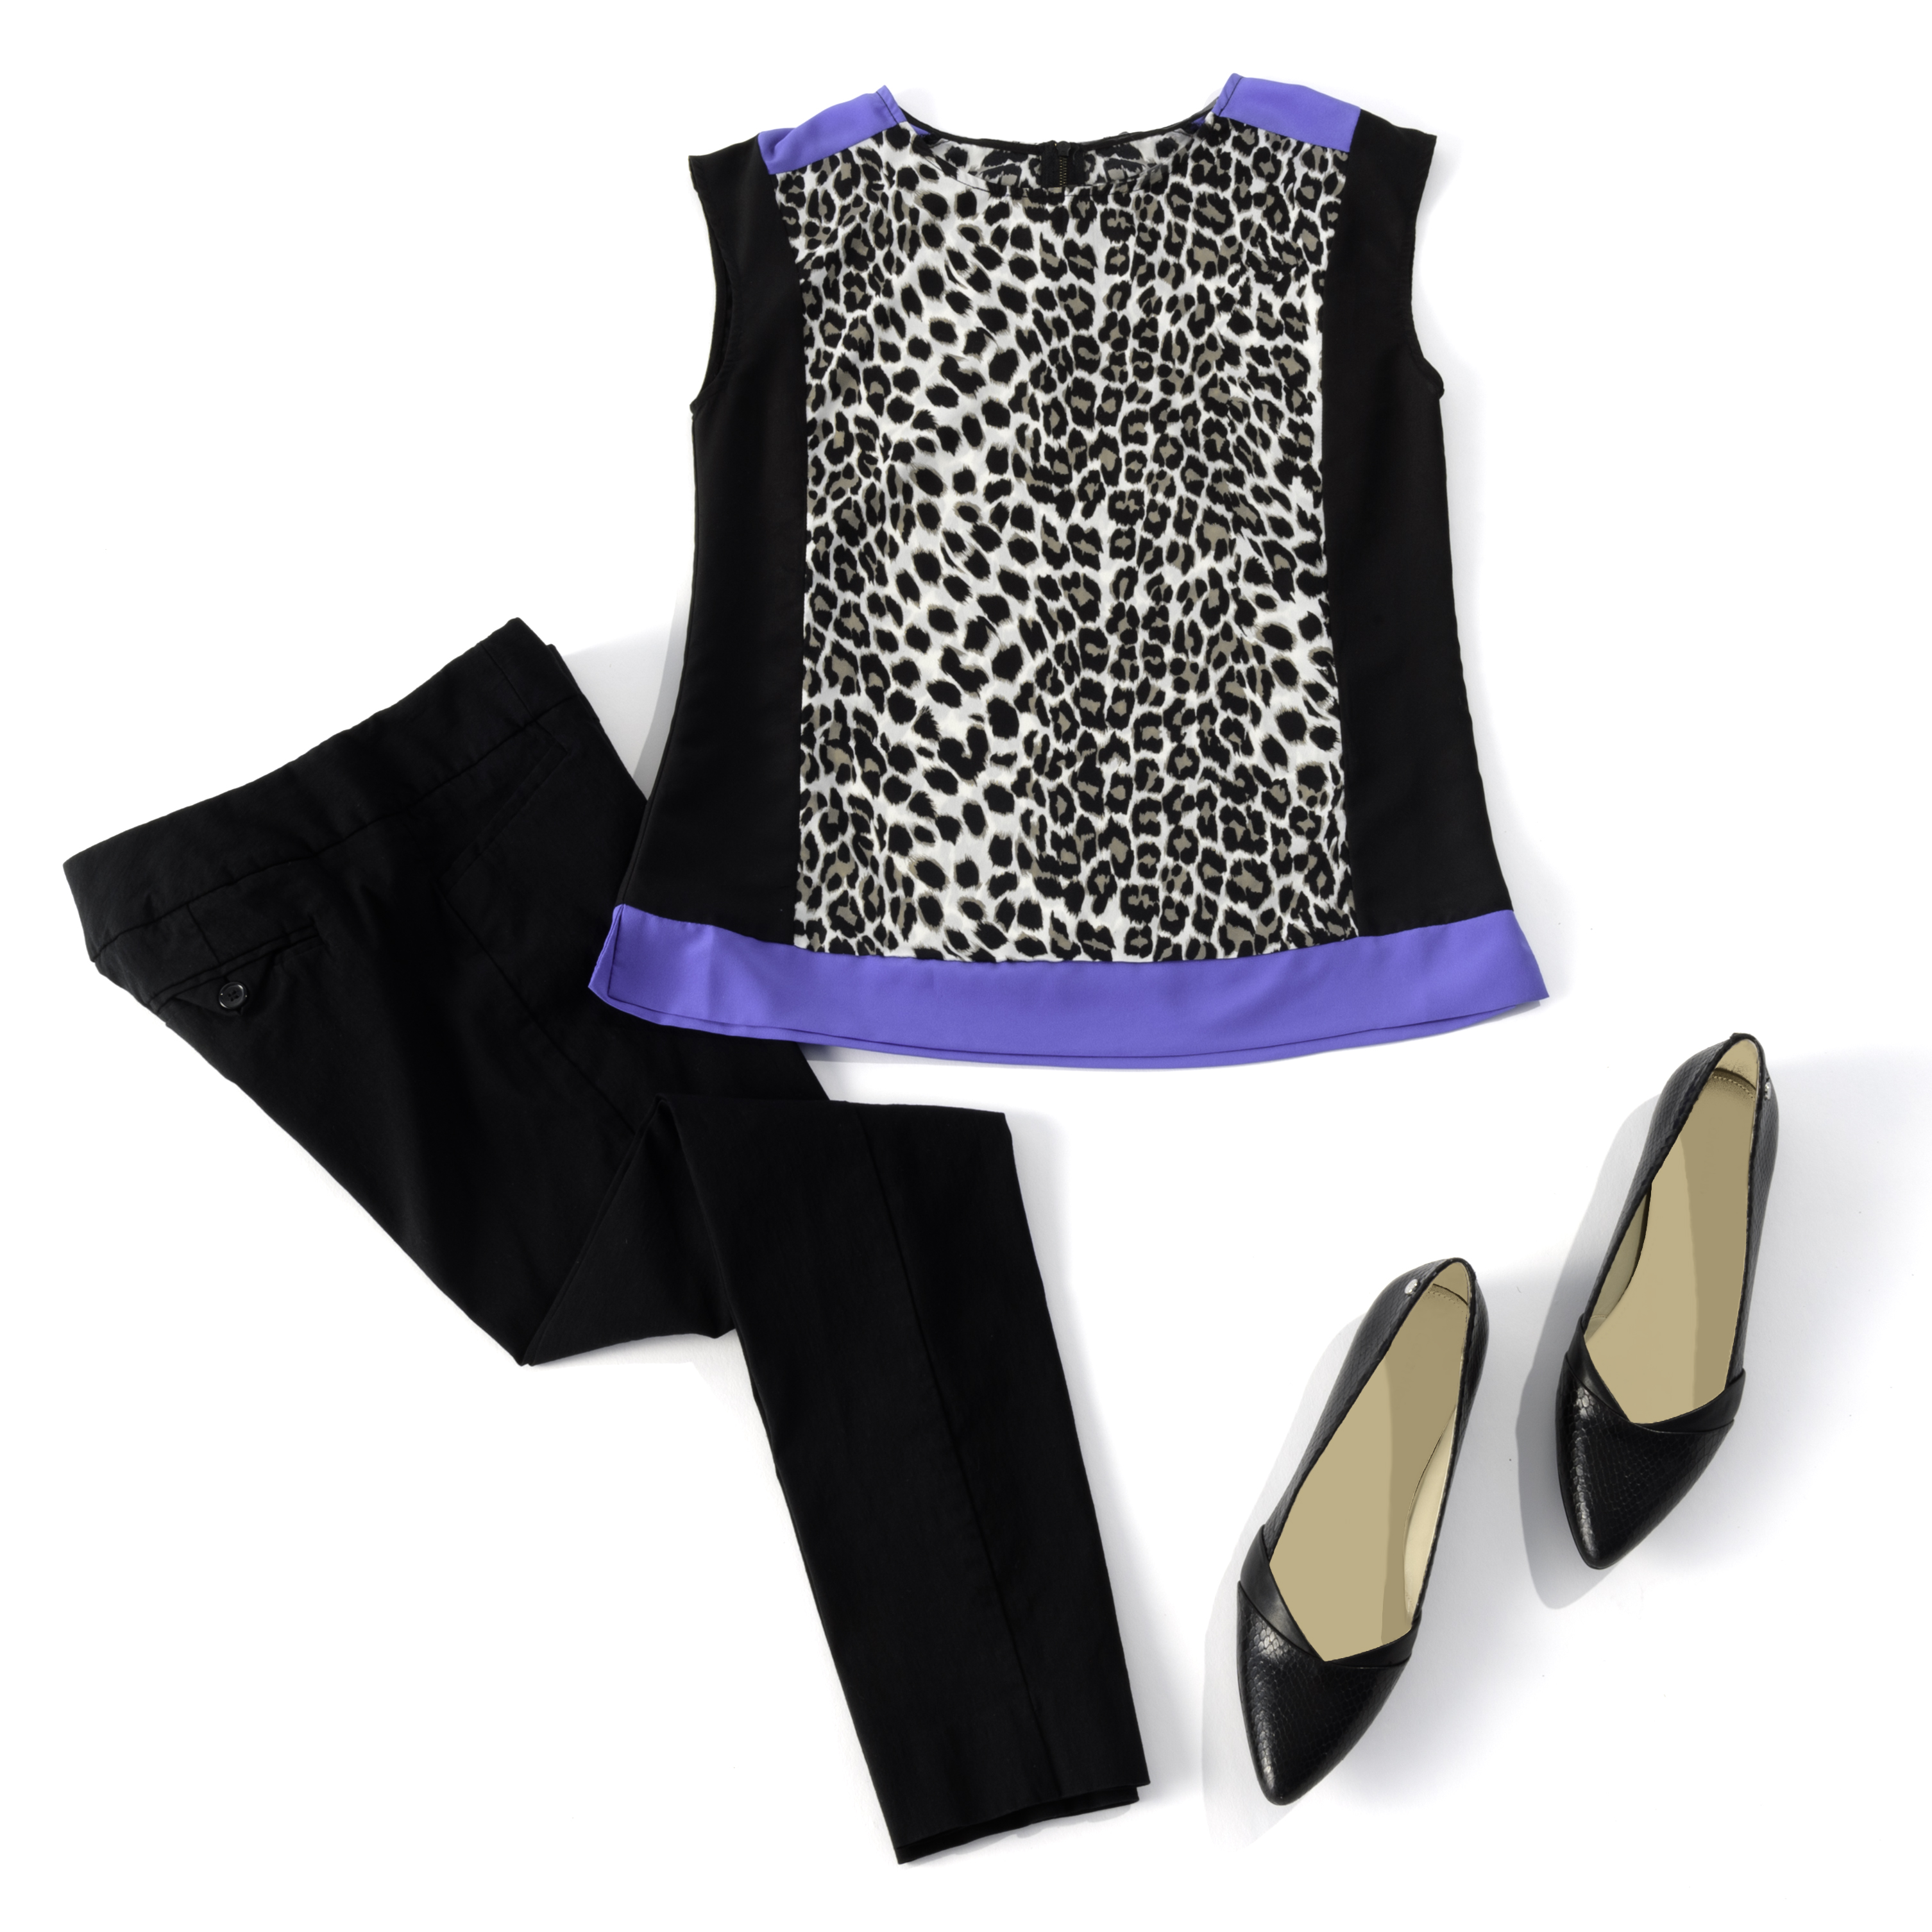 style & clothing step 3